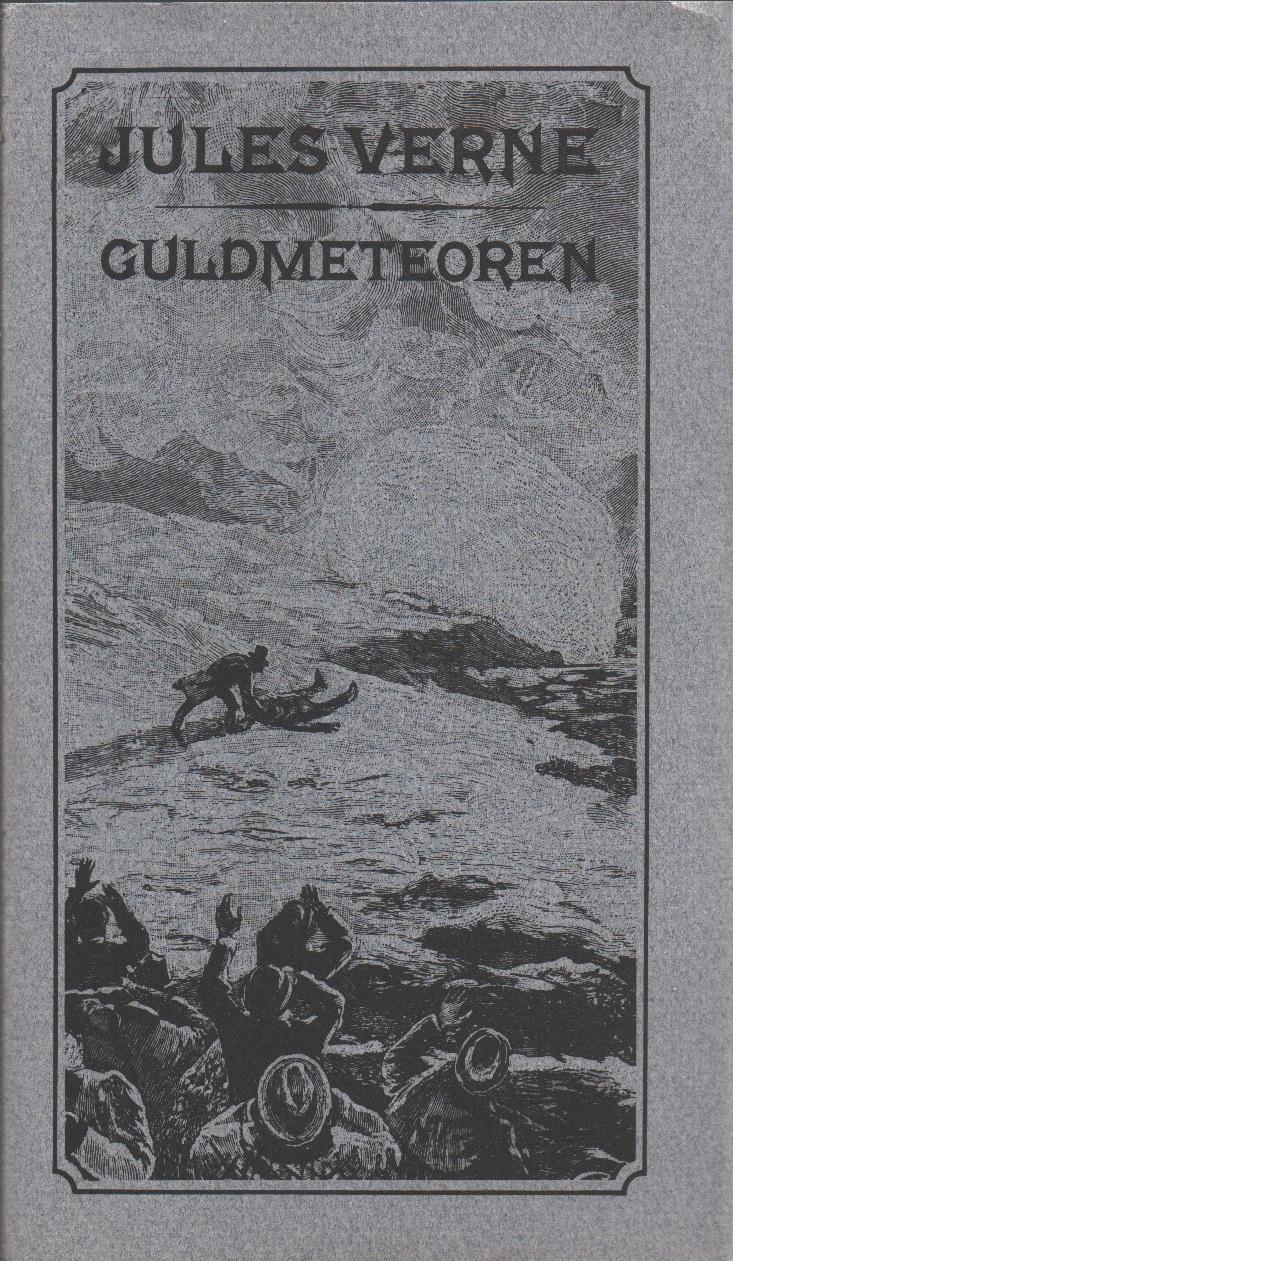 Guldmeteoren - Verne, Jules